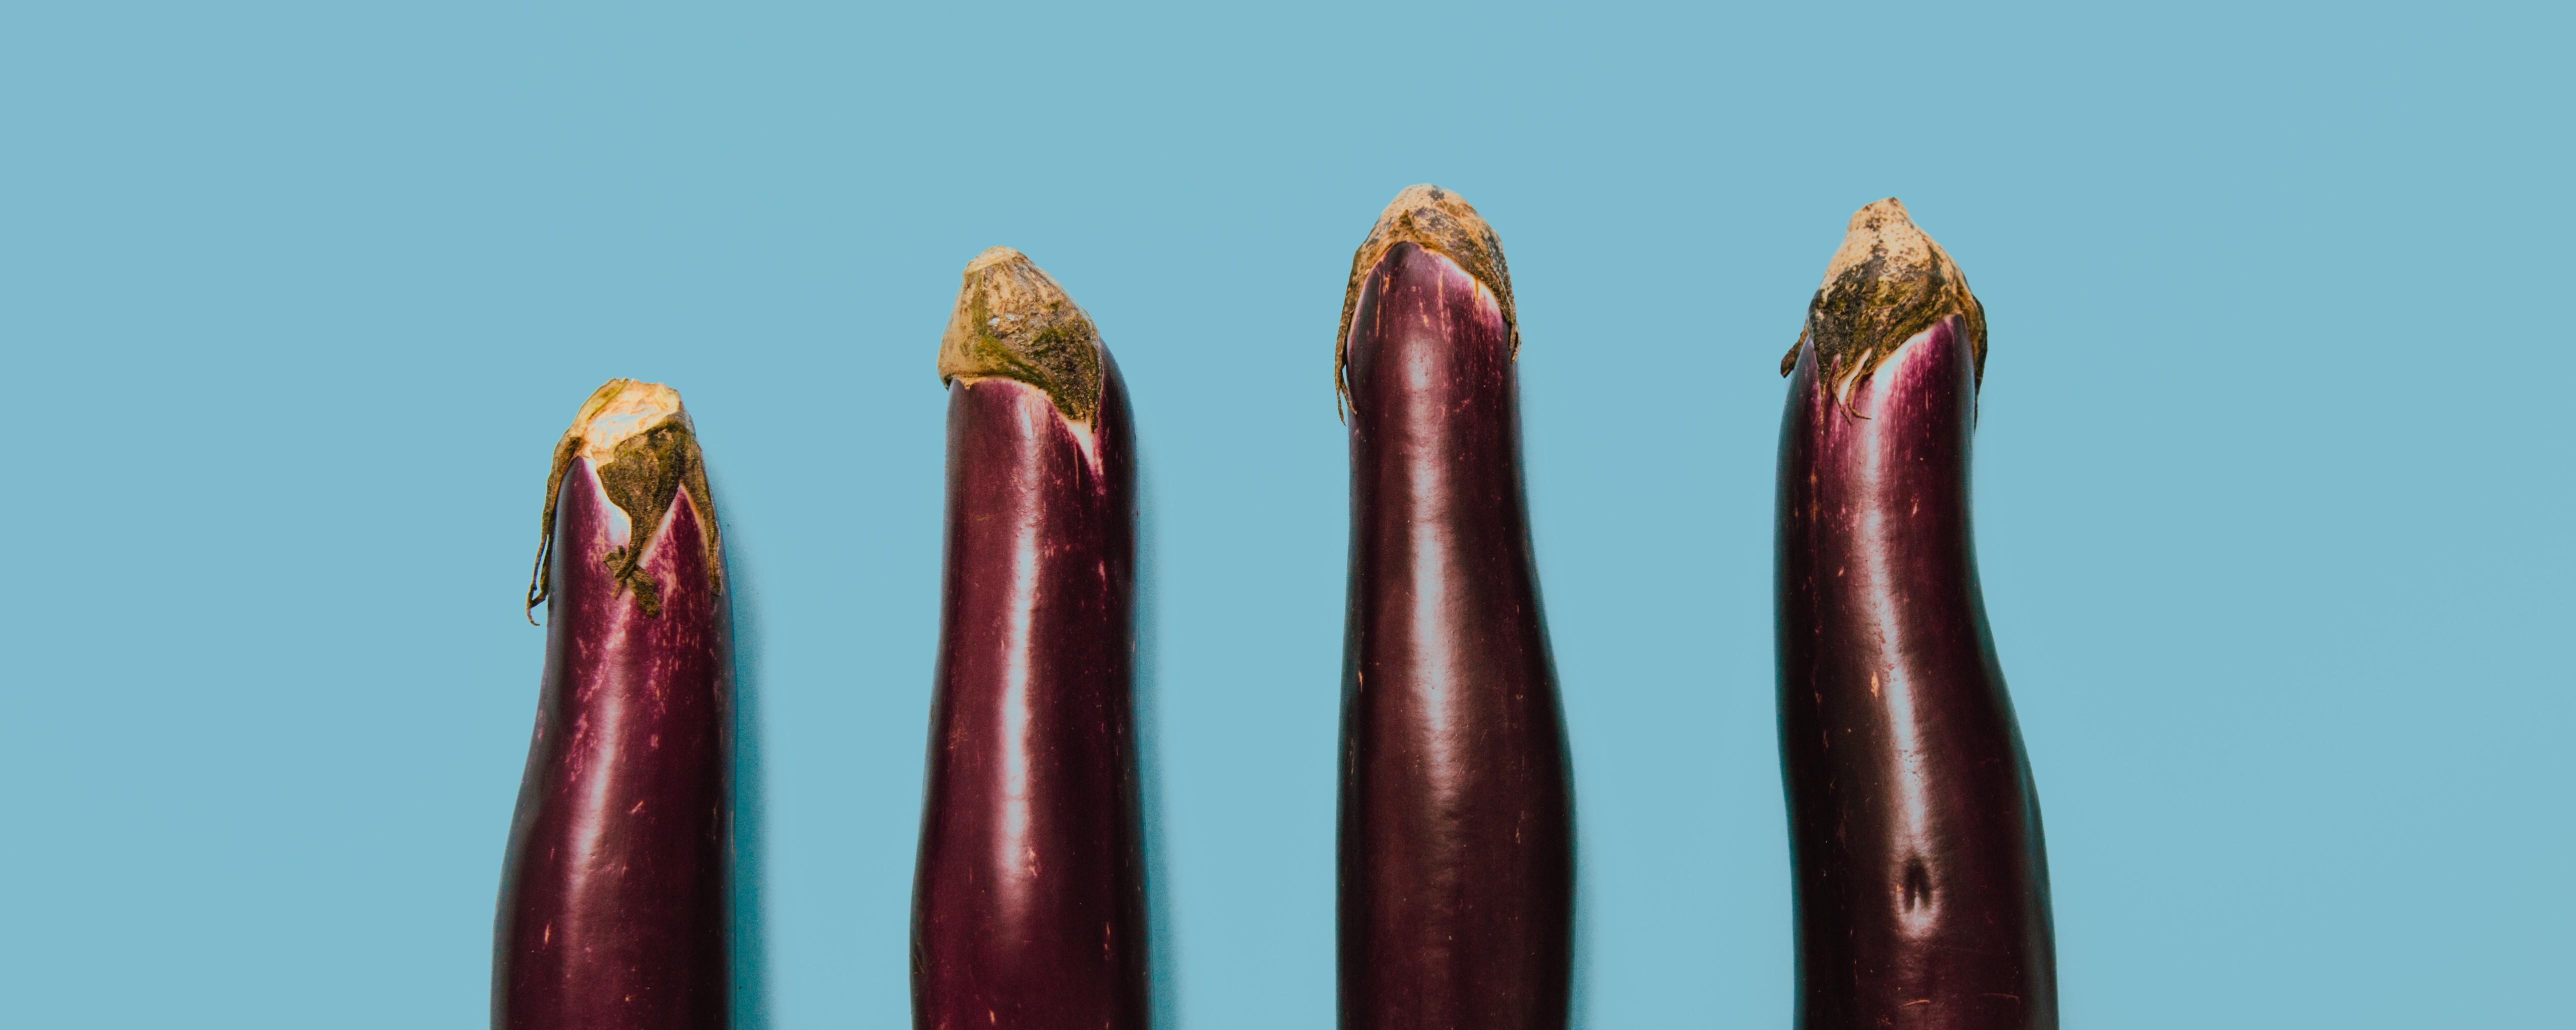 recenzii de medicamente pentru a spori erecția